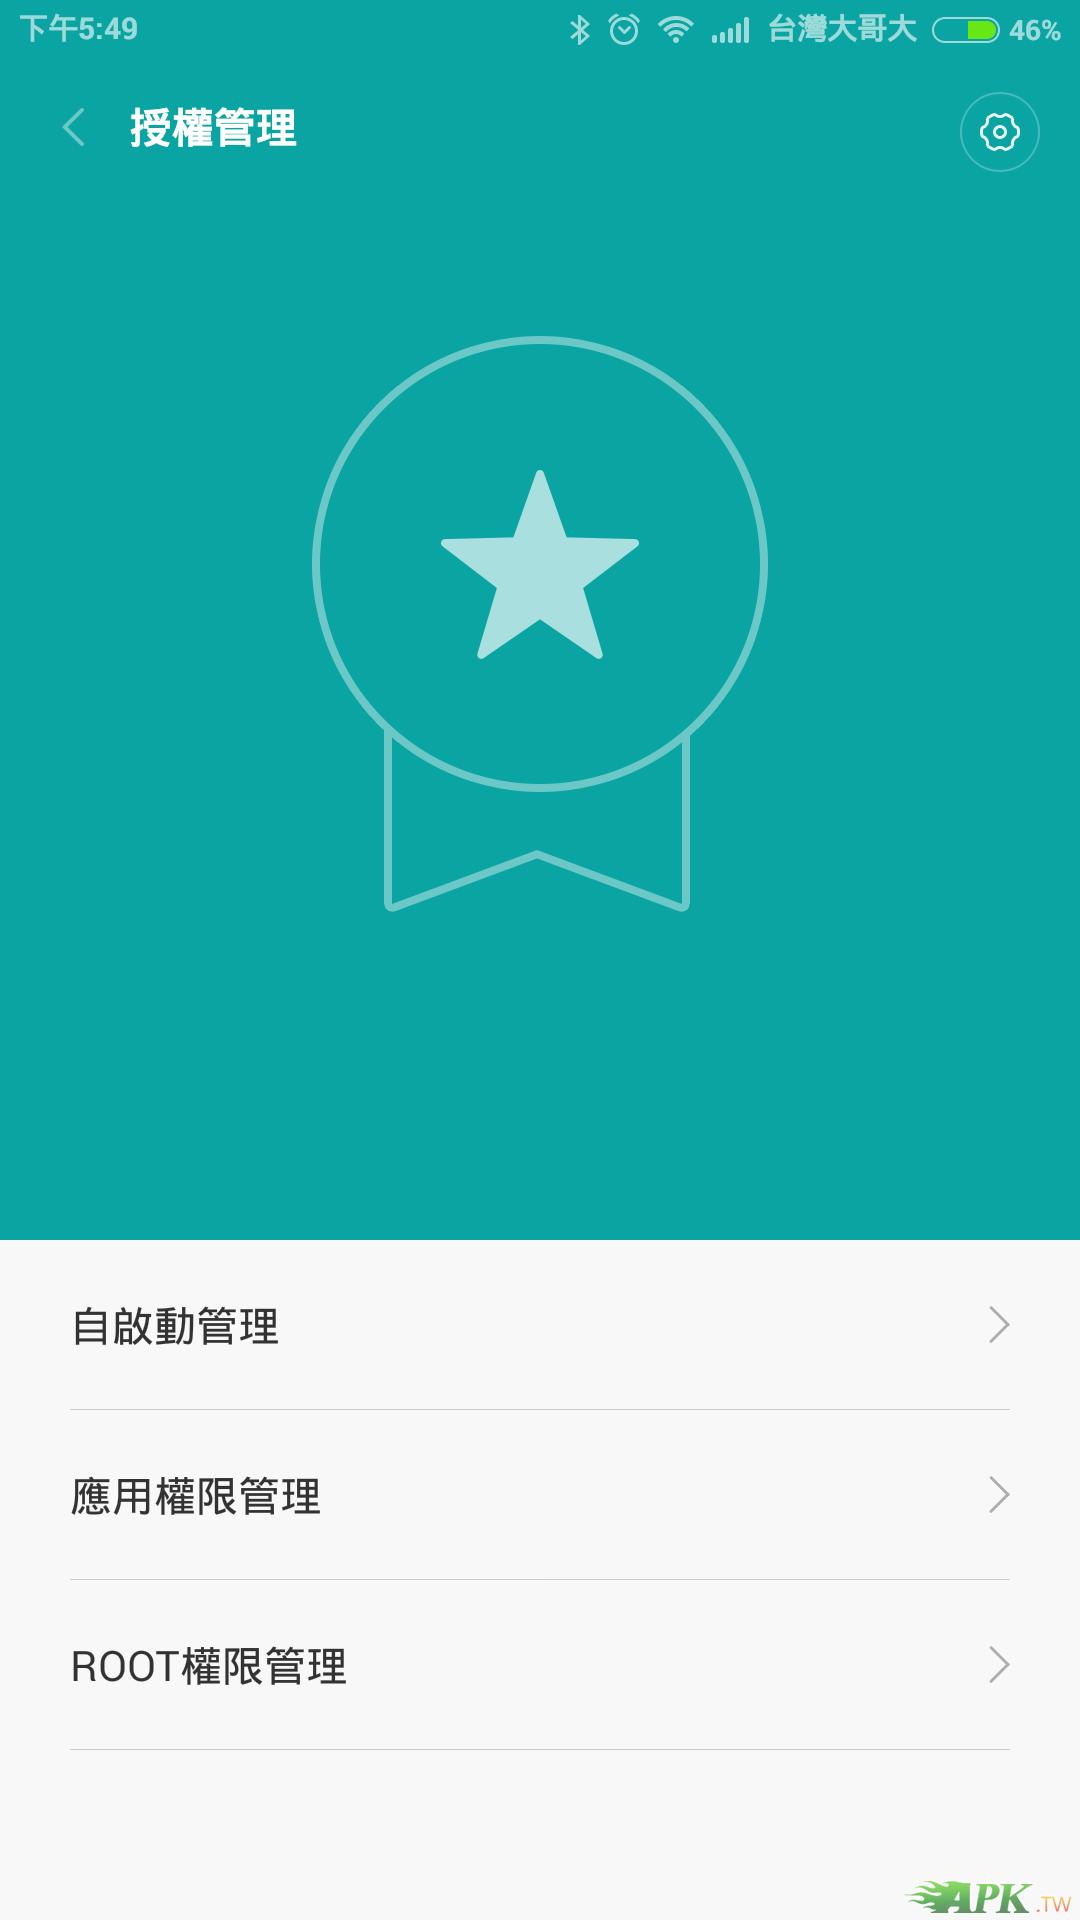 Screenshot_2015-04-16-17-49-02.png